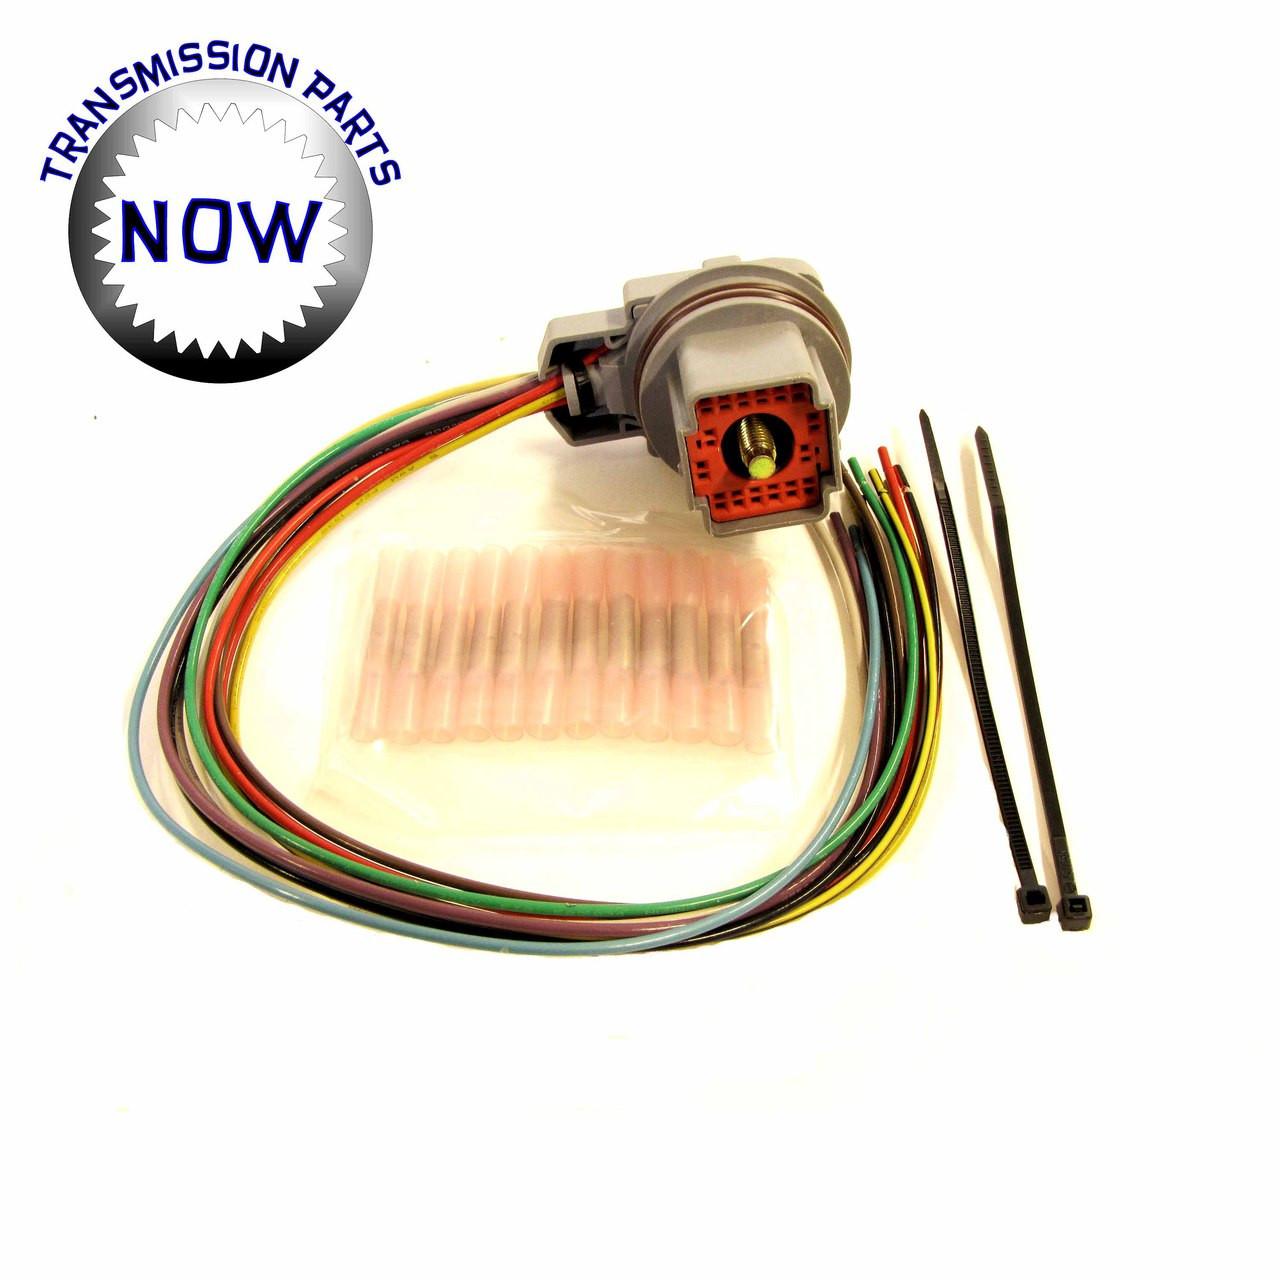 5r110 Wire Harness Auto Electrical Wiring Diagram E40d Repair Kit E4od